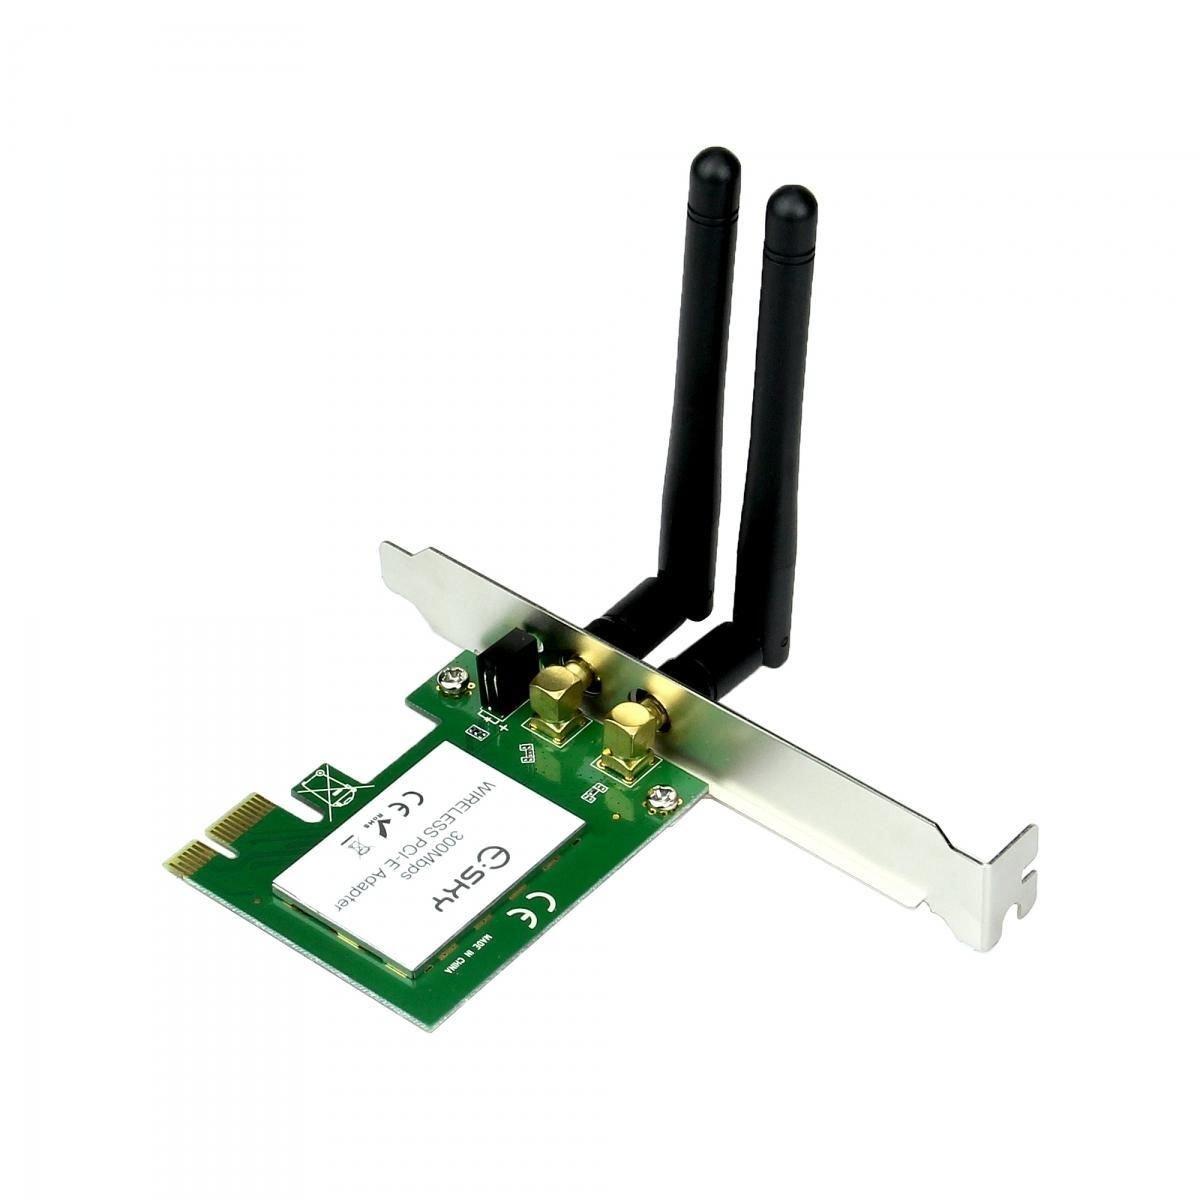 New Wireless Lan PCI-e PCI Express Adapter Card 300Mbps Fast 2 Antenna